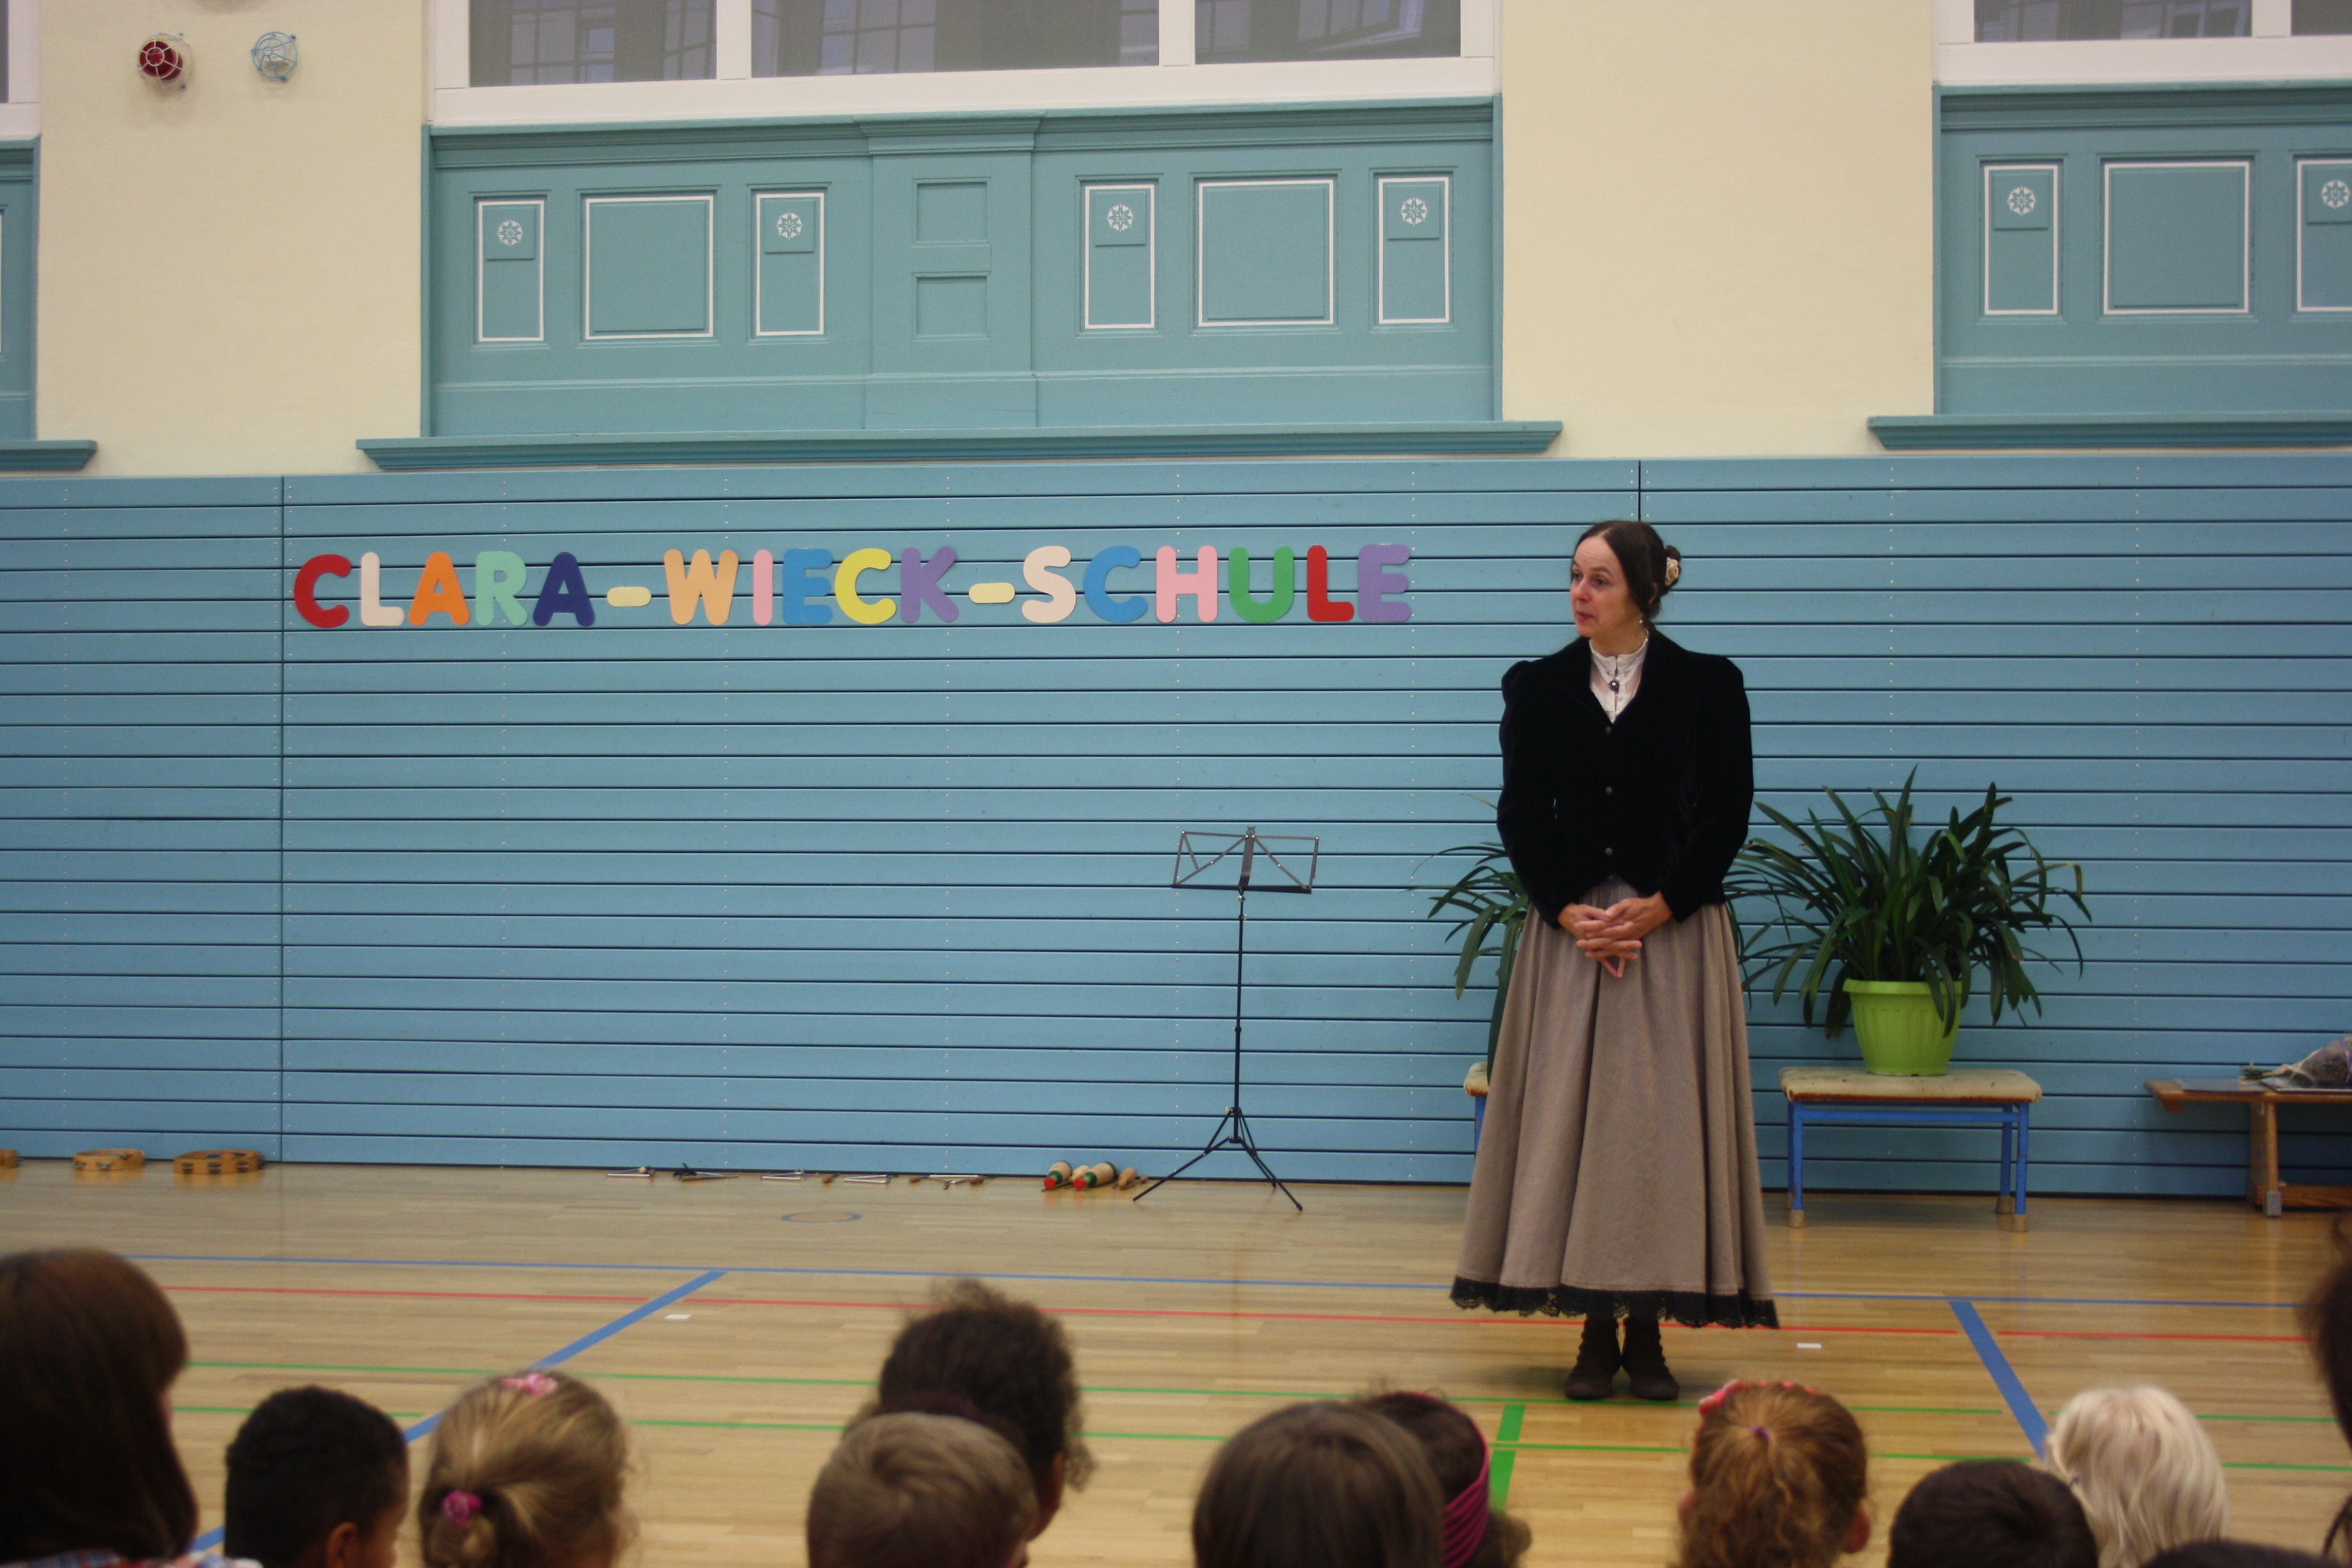 Aus 21. wird Clara-Wieck-Schule